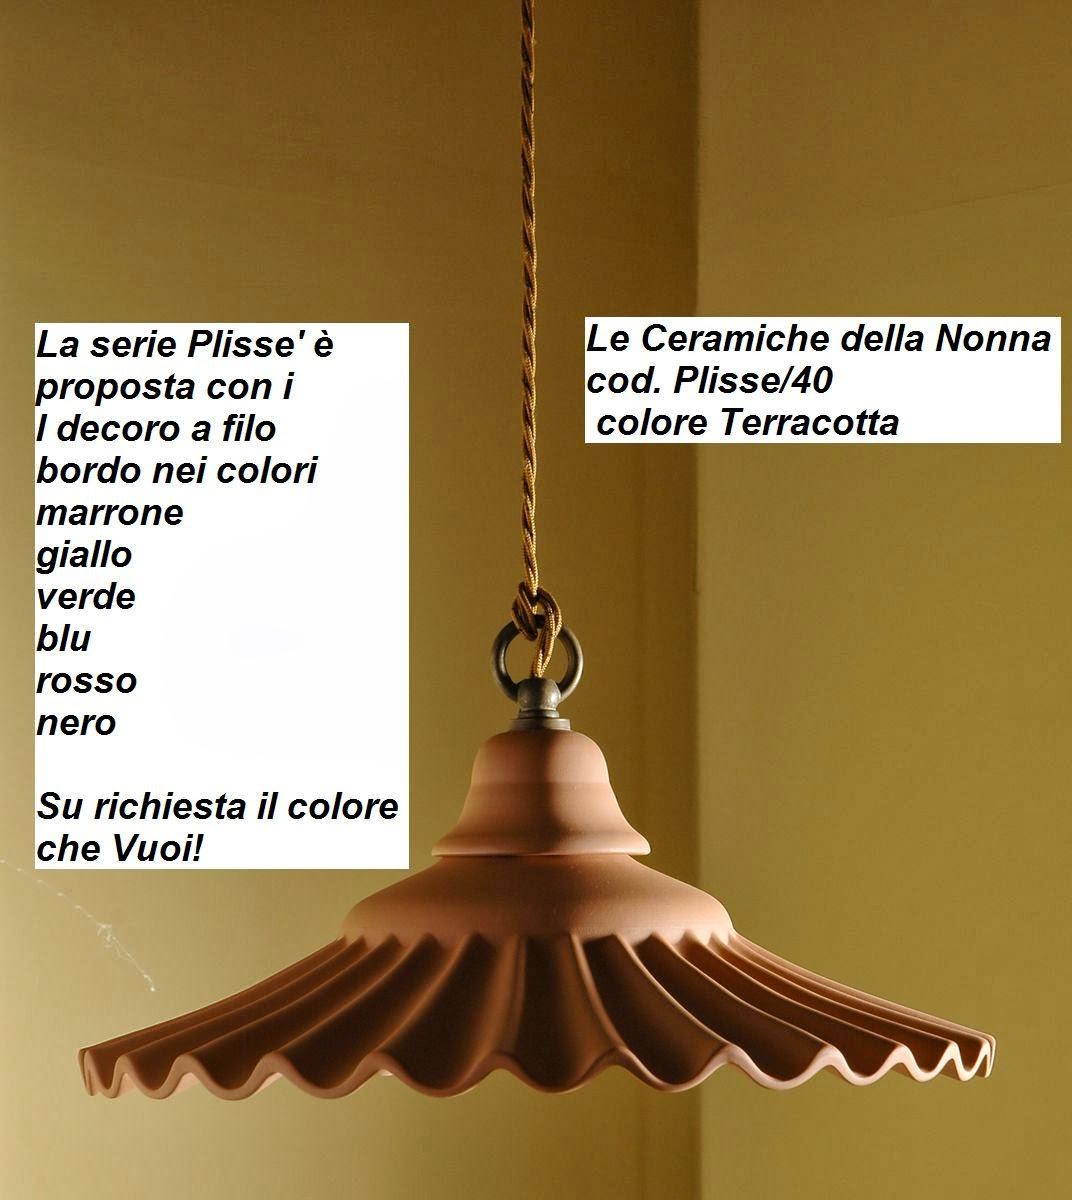 Lampadari Per Cucina Rustica. Lampadari Cuore Cromo Lucido Paralumi ...